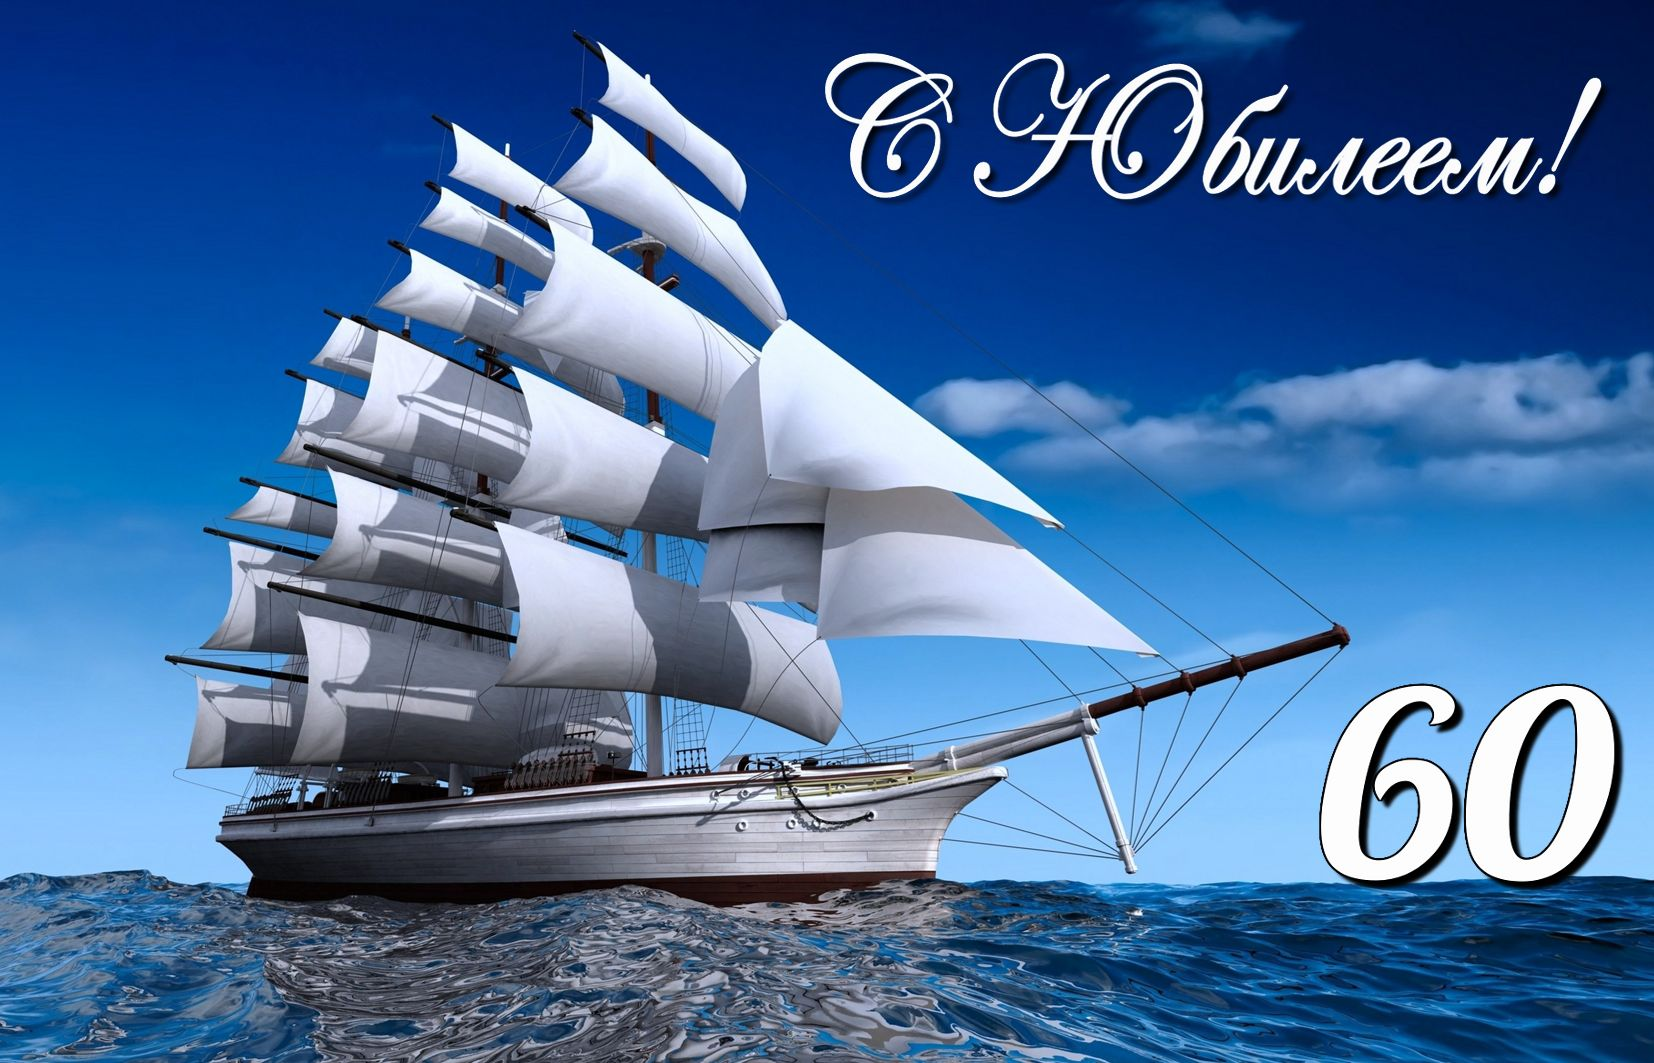 Яхта в синем море на юбилей 60 лет